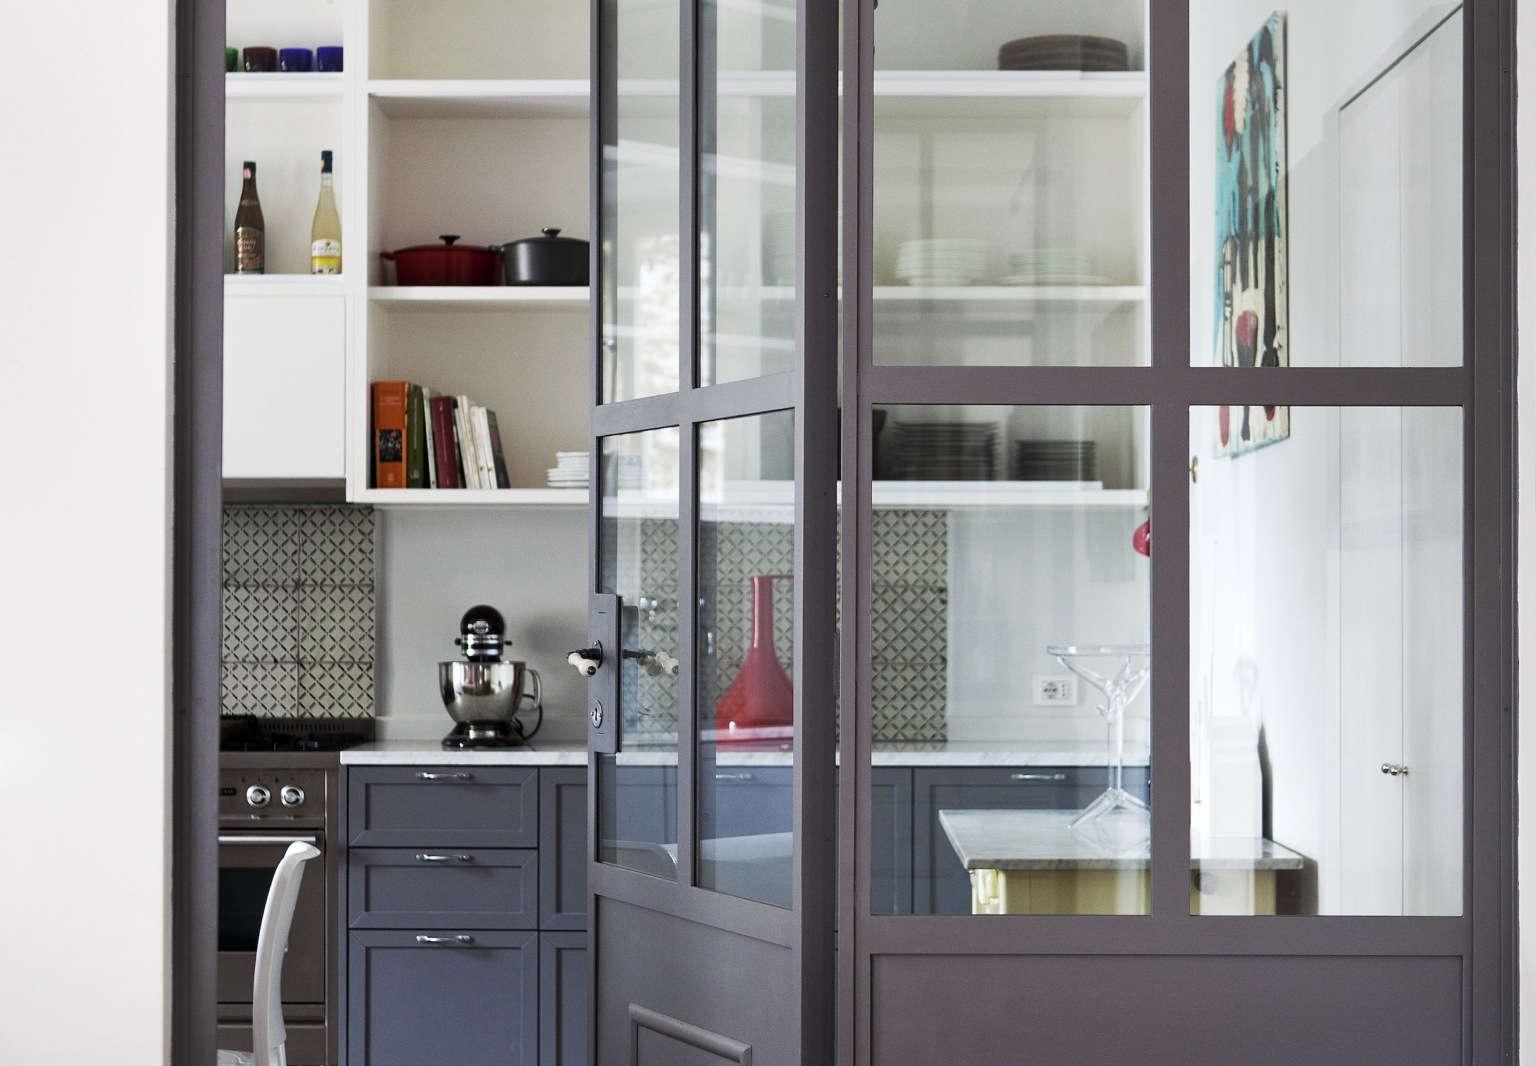 studio strato tuscan red house rome doorway into kitchen serena eller